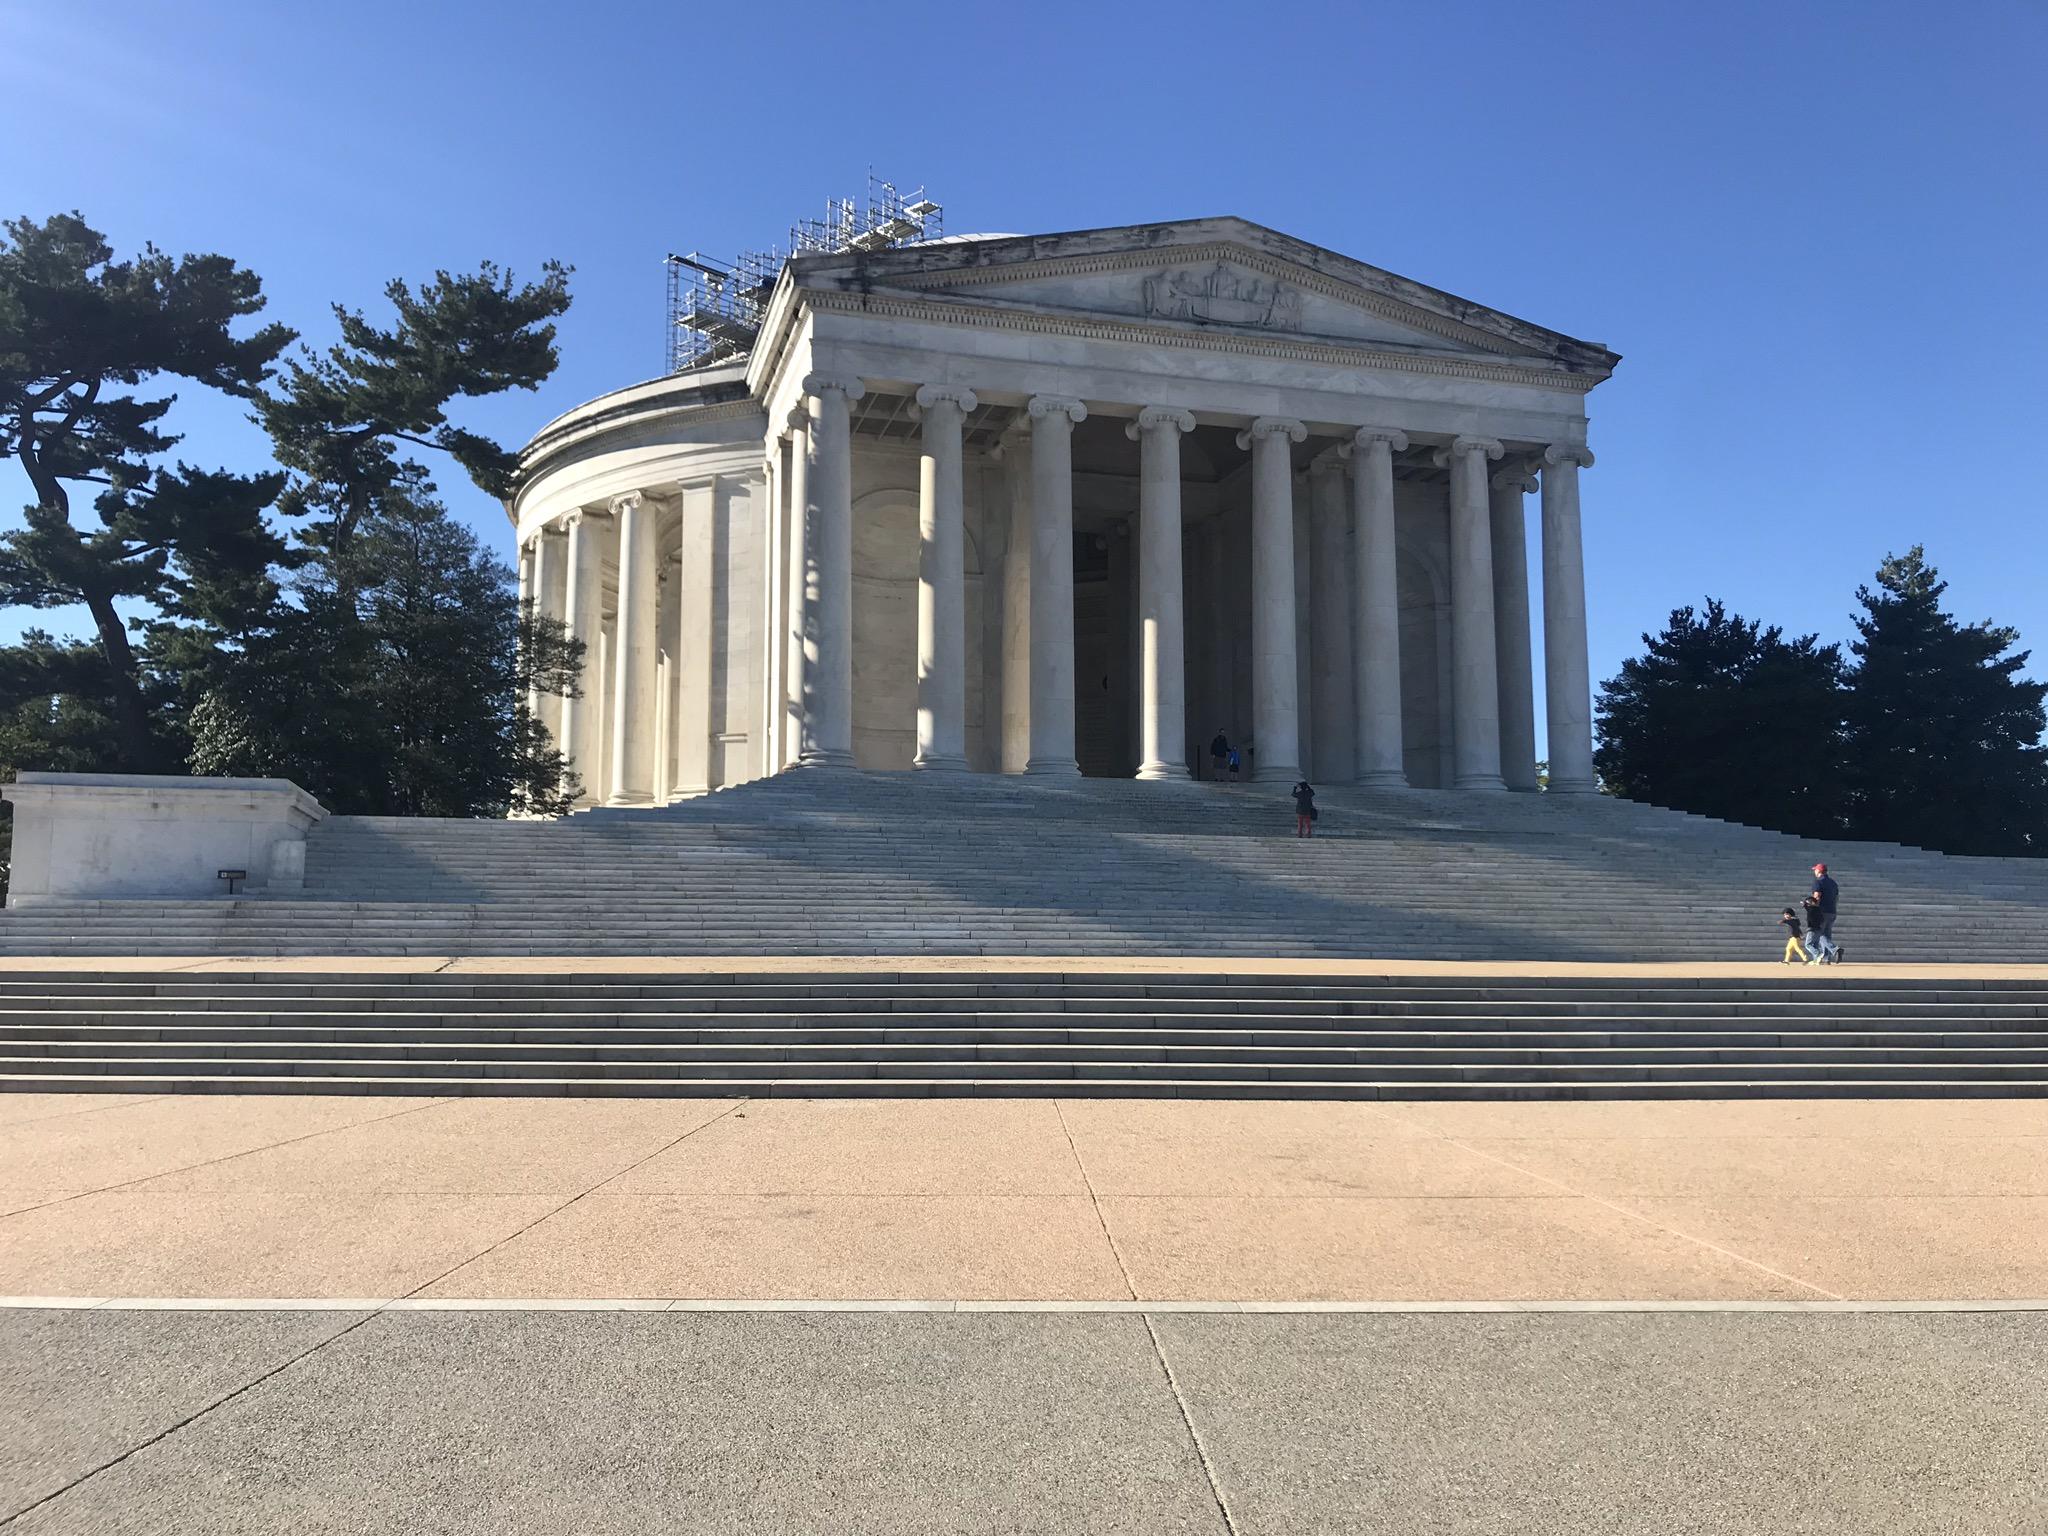 Jefferson-Memorial-up-close.jpg